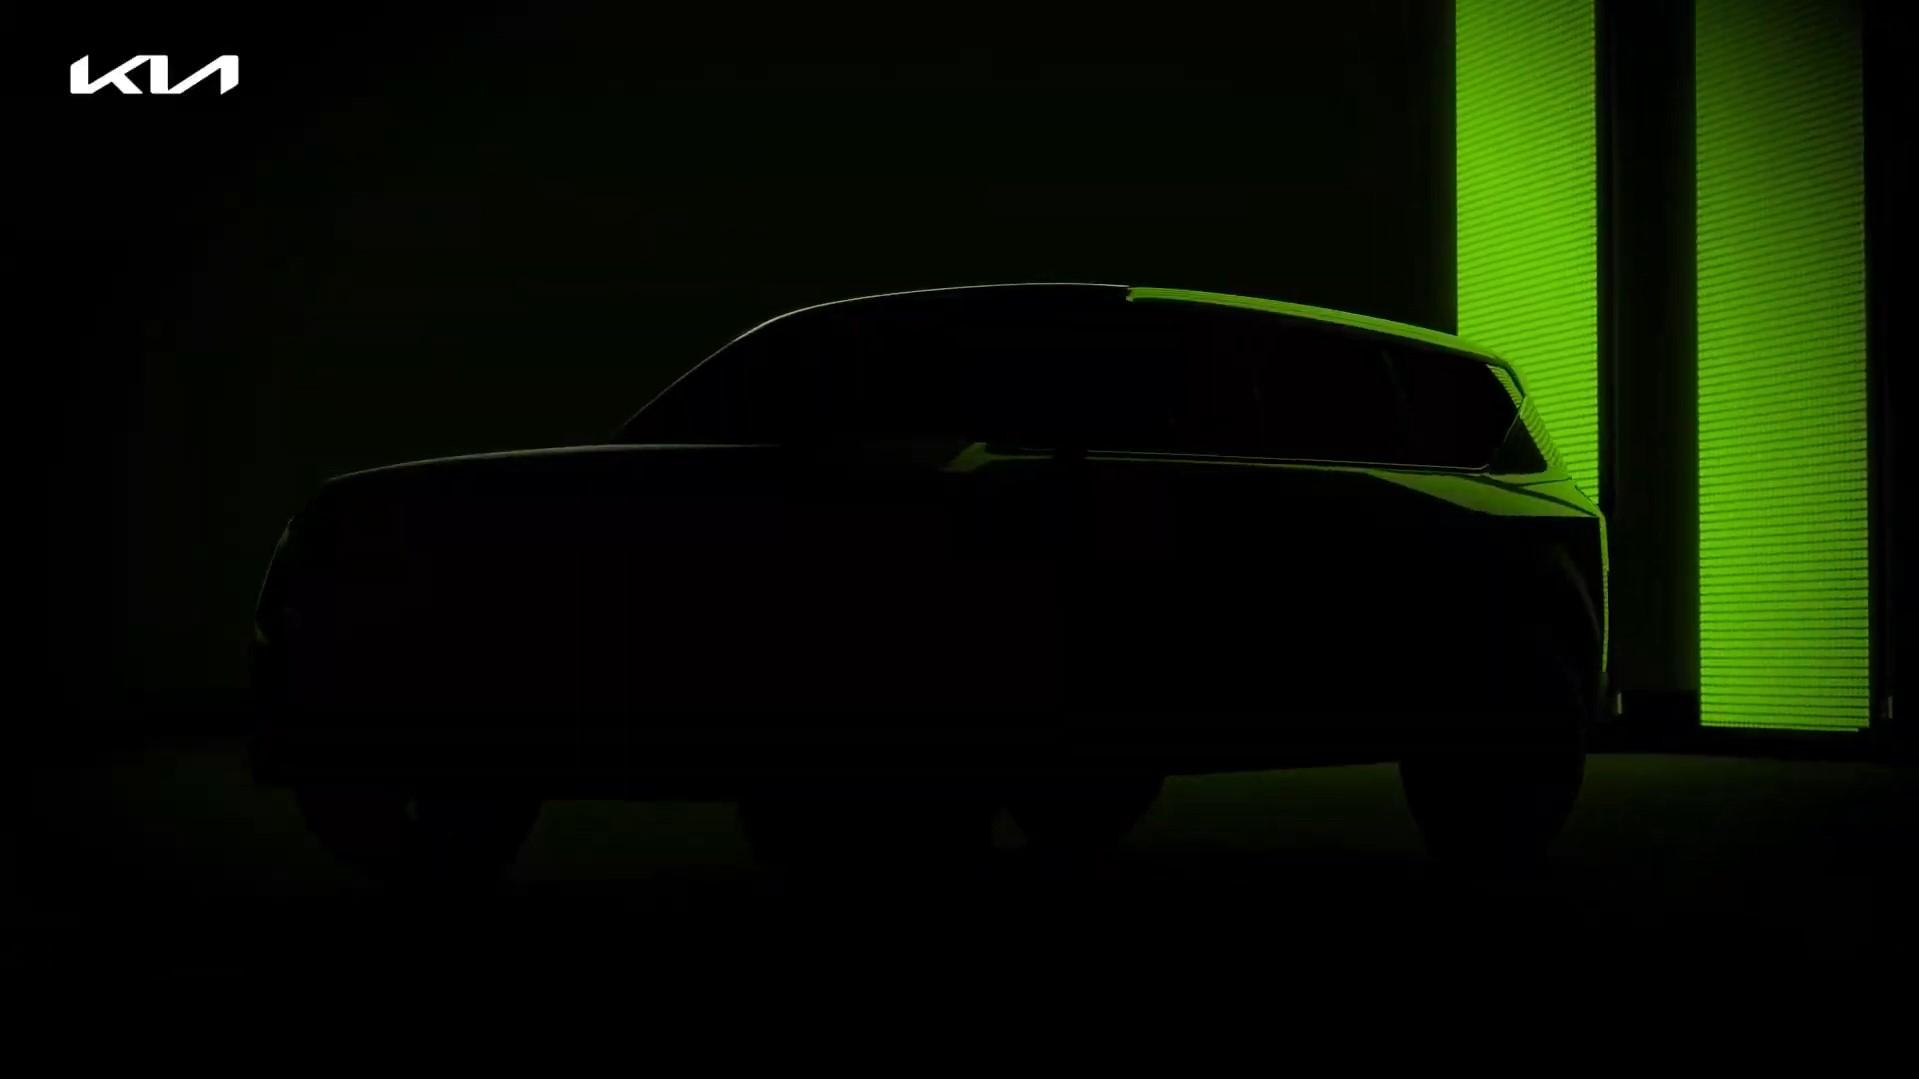 Kia Teaser Green SUV